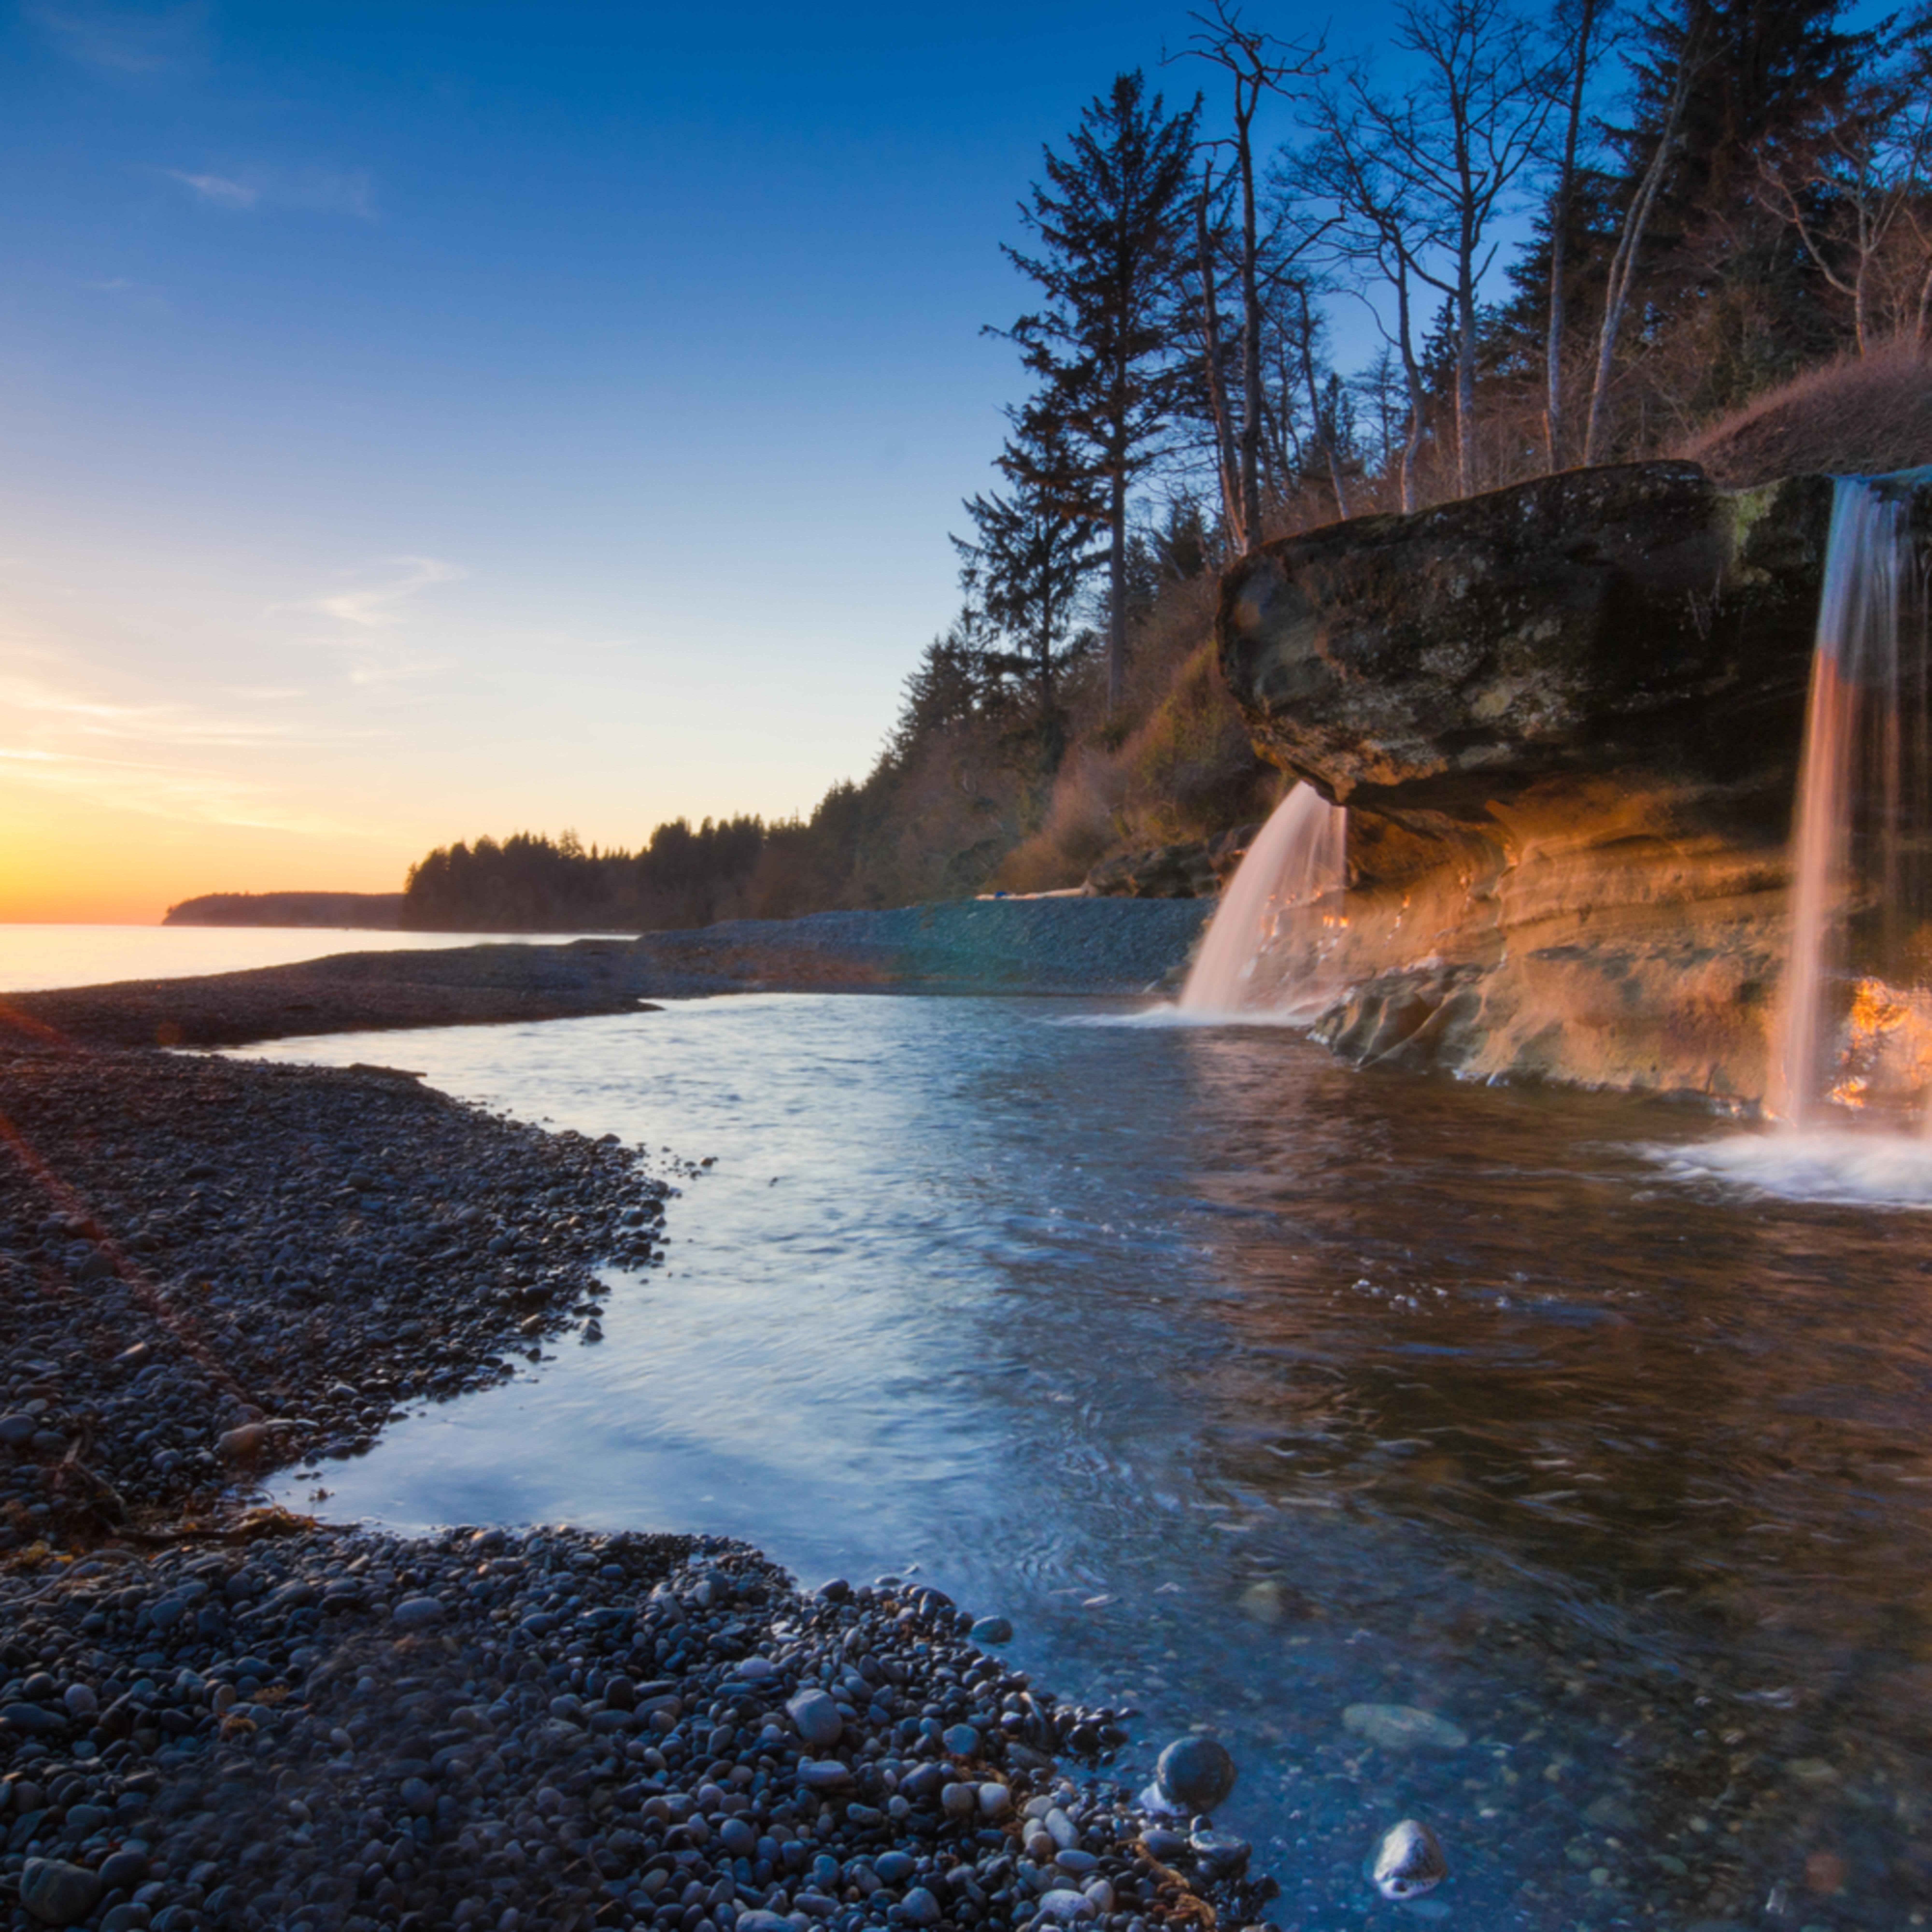 Sandcut beach waterfall sunset heather k jones n8vais